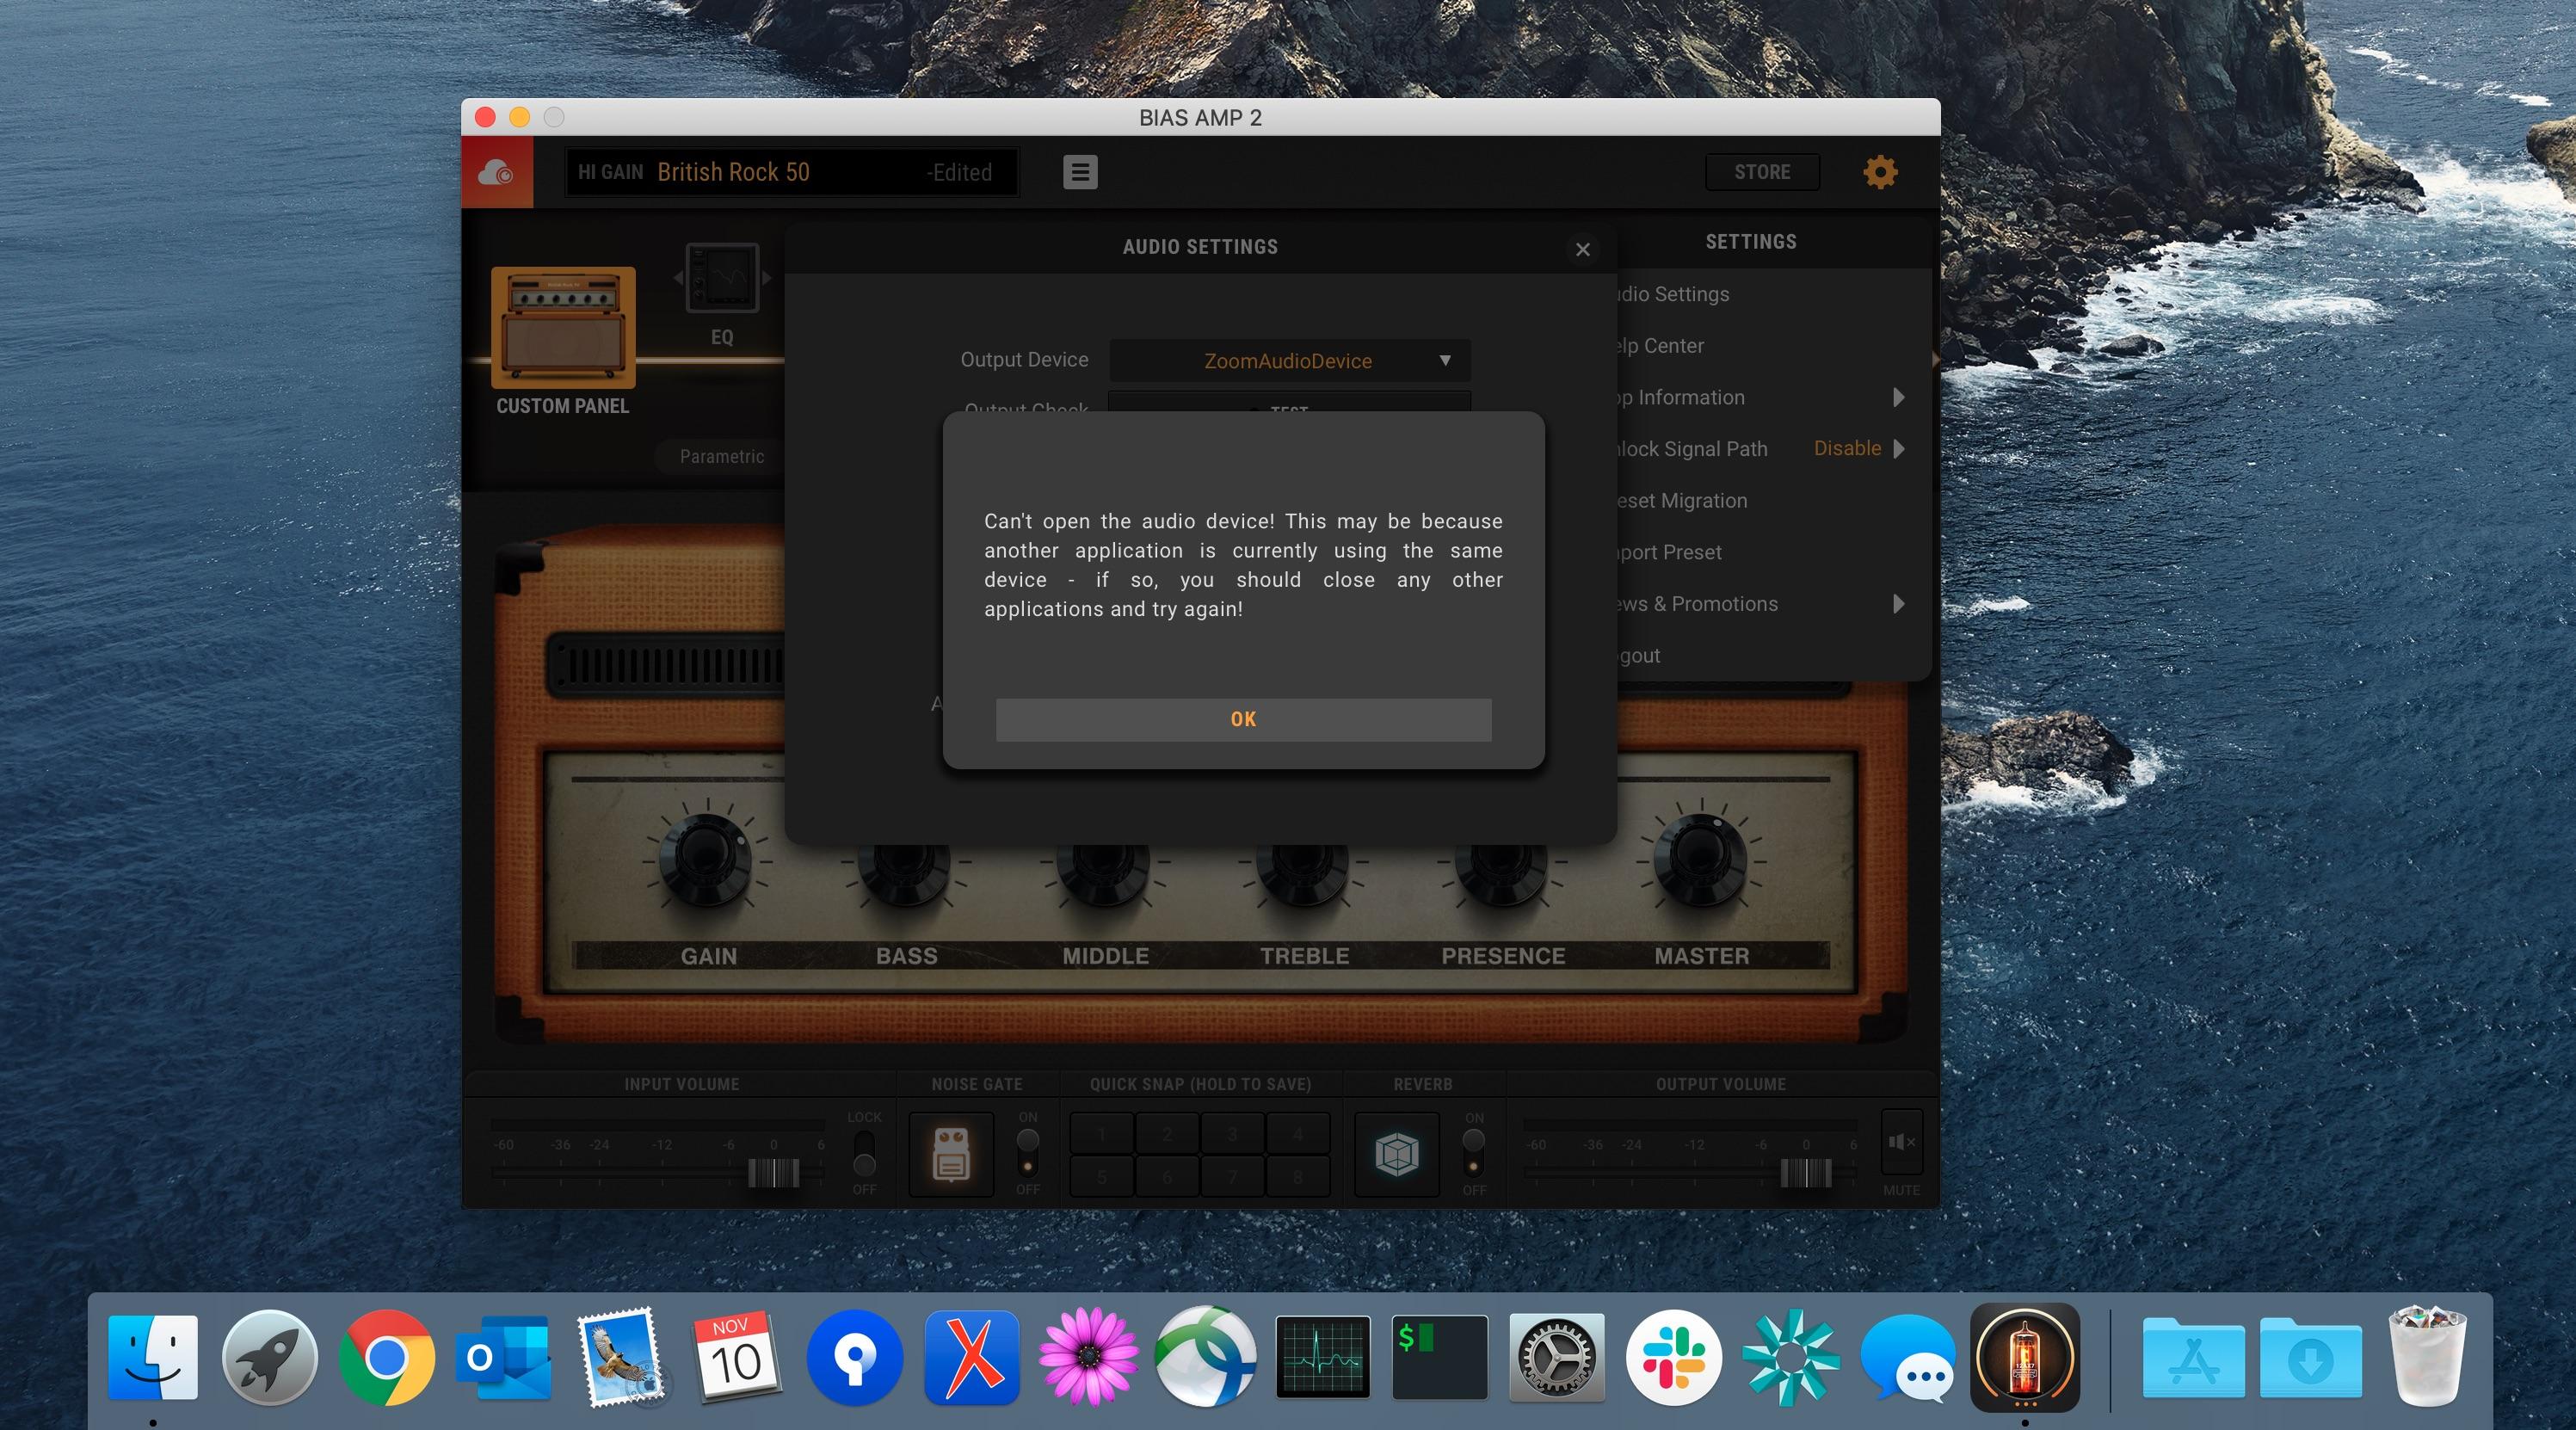 0_1605039355704_Screen Shot 2020-11-10 at 8.27.28 AM.jpg